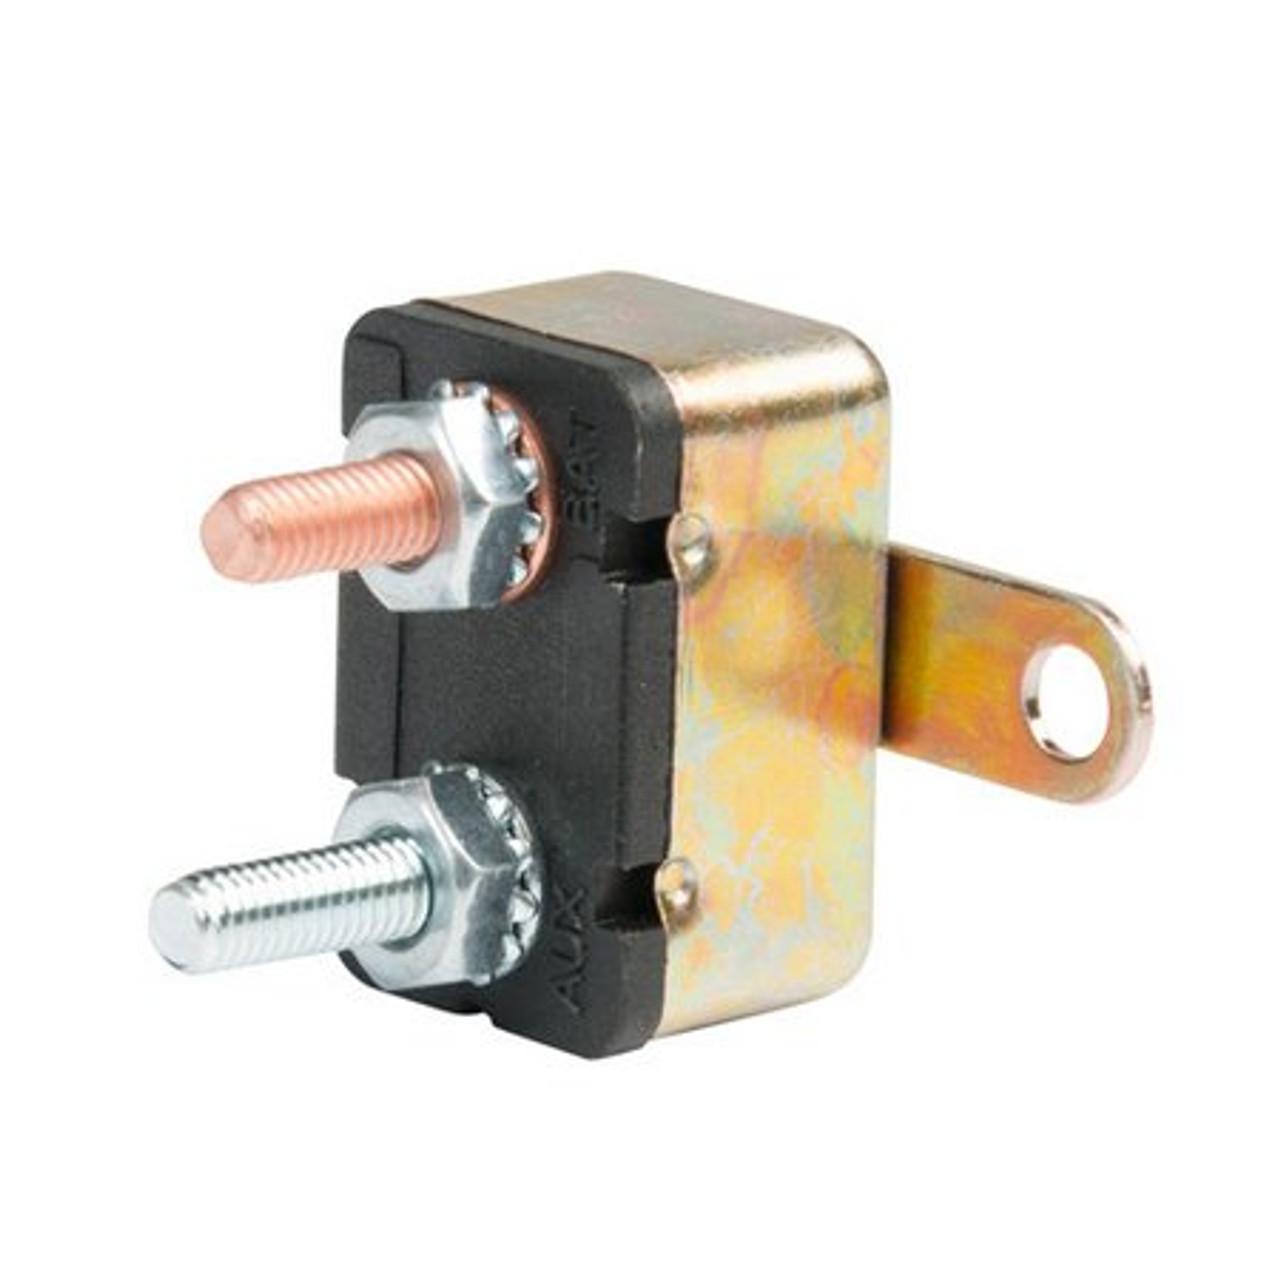 12 volt 40 Amp DC Auto Reset Circuit Breaker Type 1 for Wind, Solar, Automotive